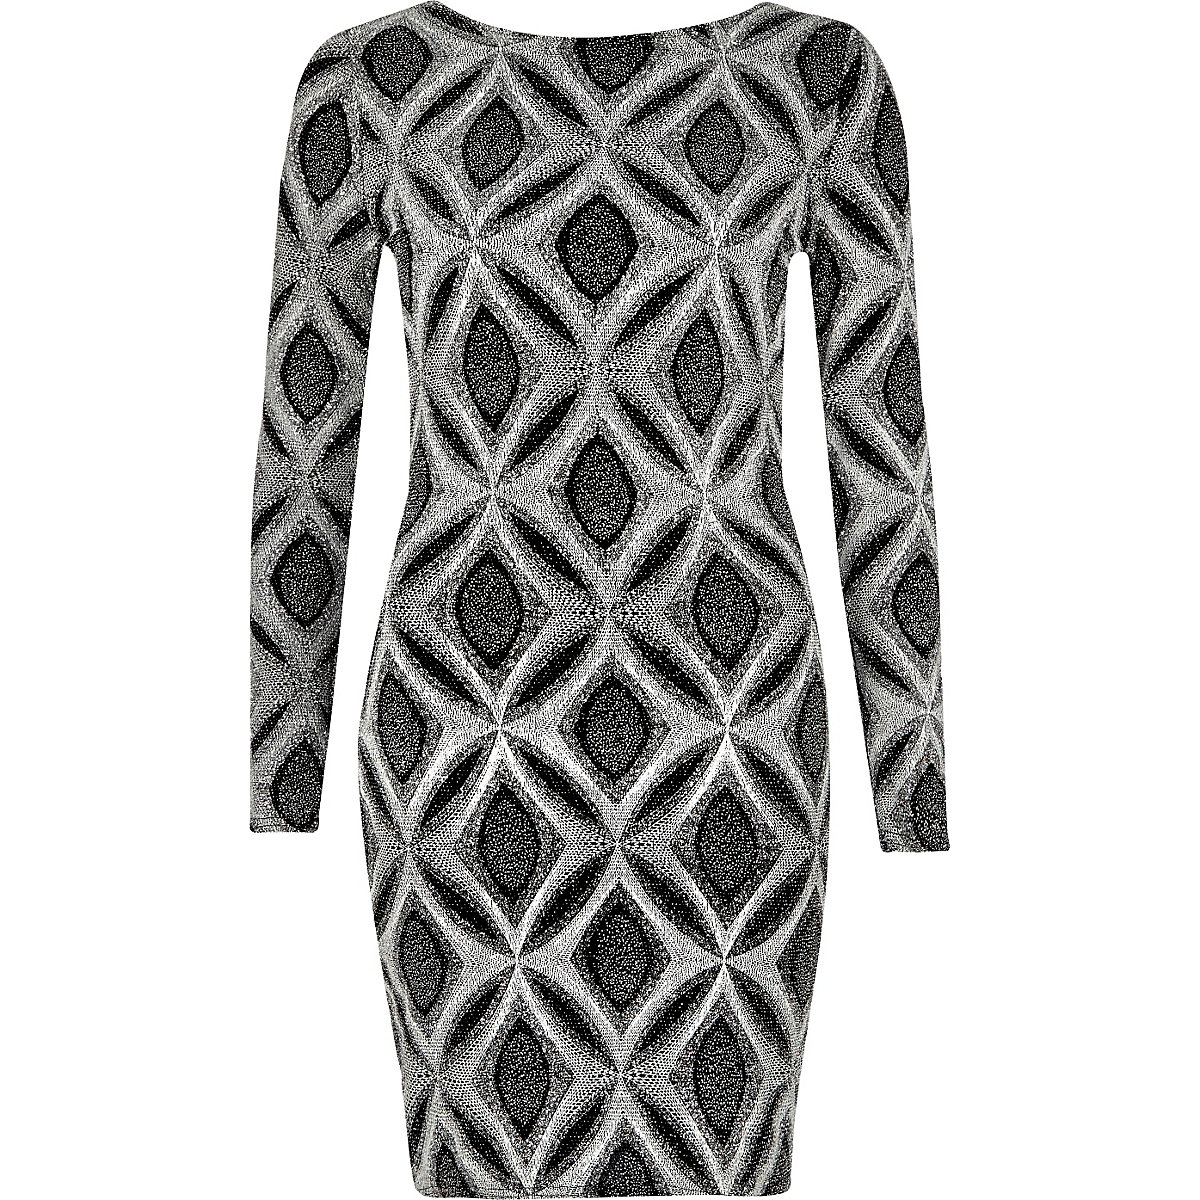 79160209ee Silver sparkly metallic bodycon dress - Bodycon Dresses - Dresses - women